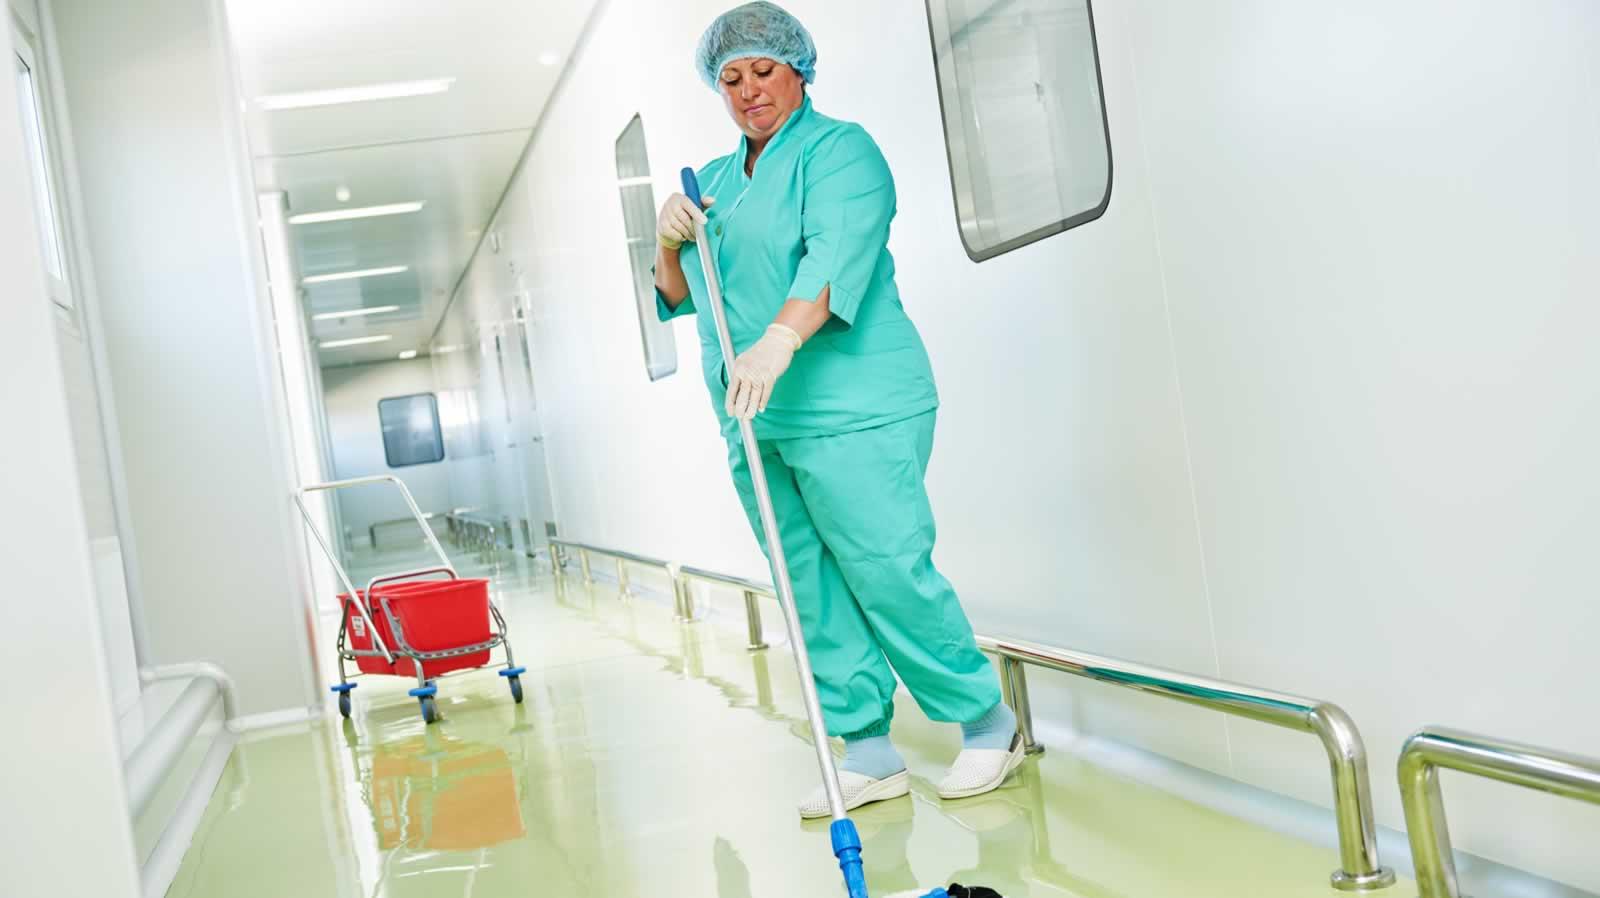 Personal para limpieza hospitalaria